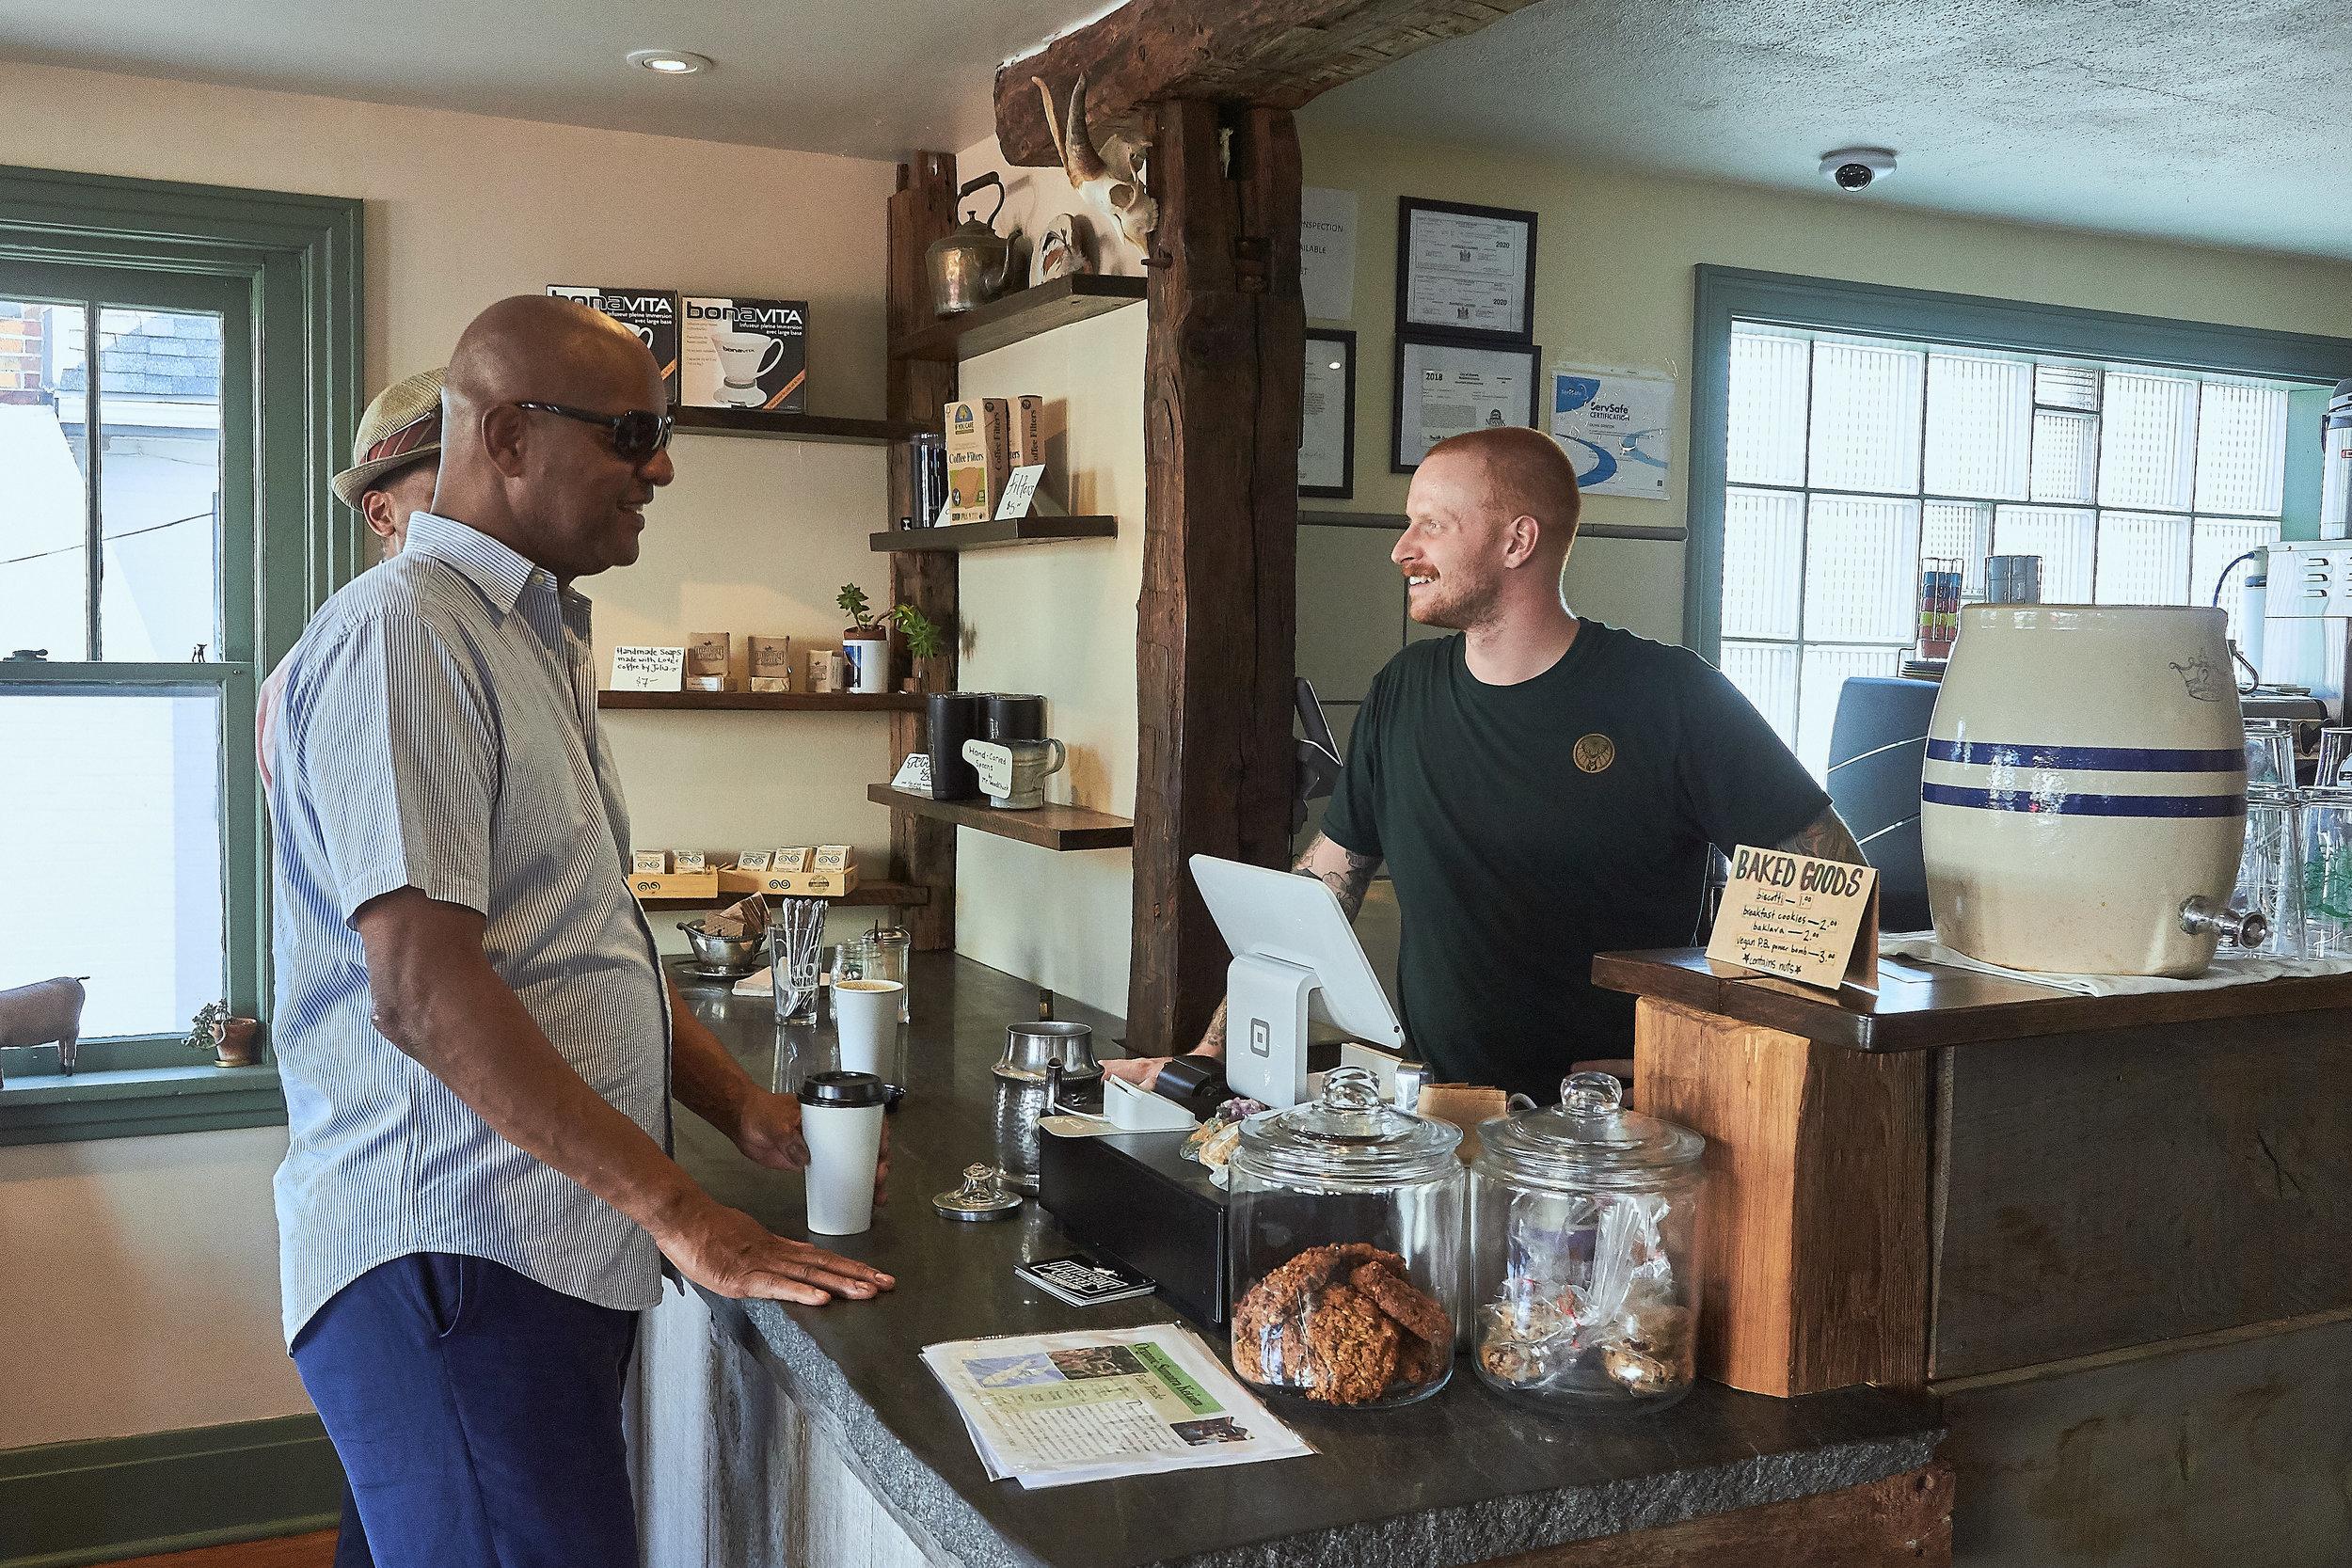 - providing Newark freshly brewed coffee daily